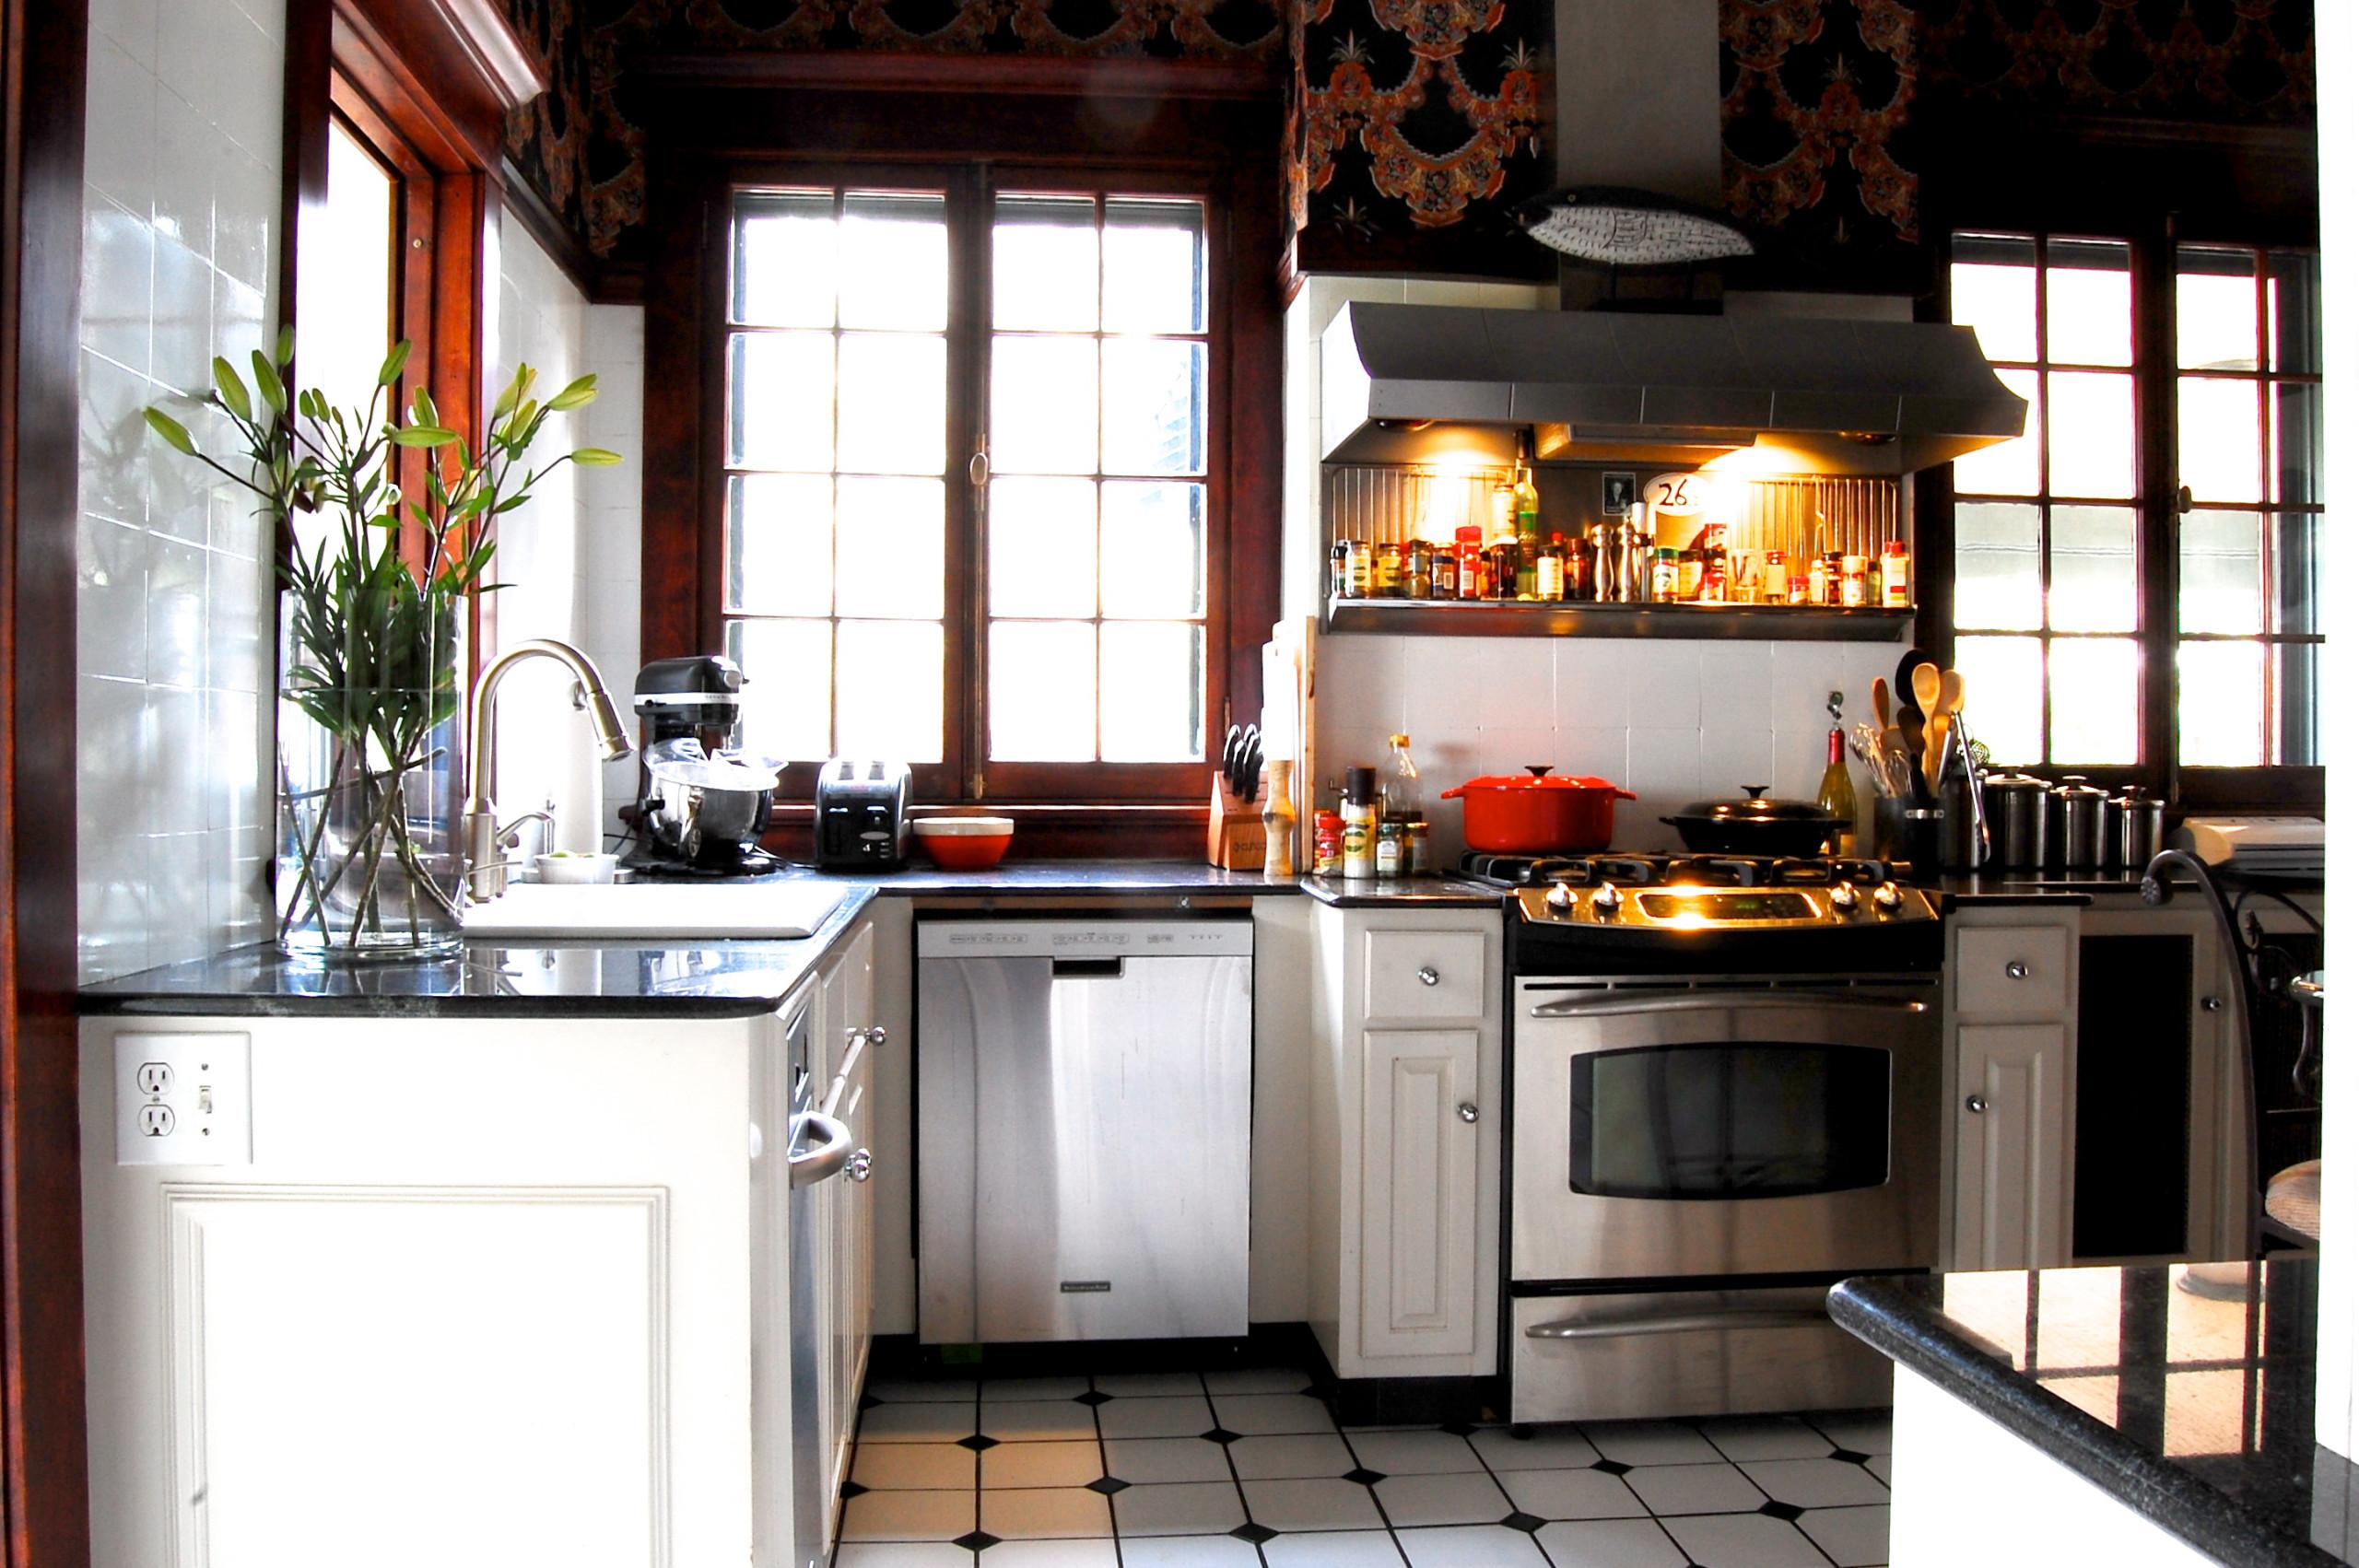 Circa Early 1900s Kitchens Houzz